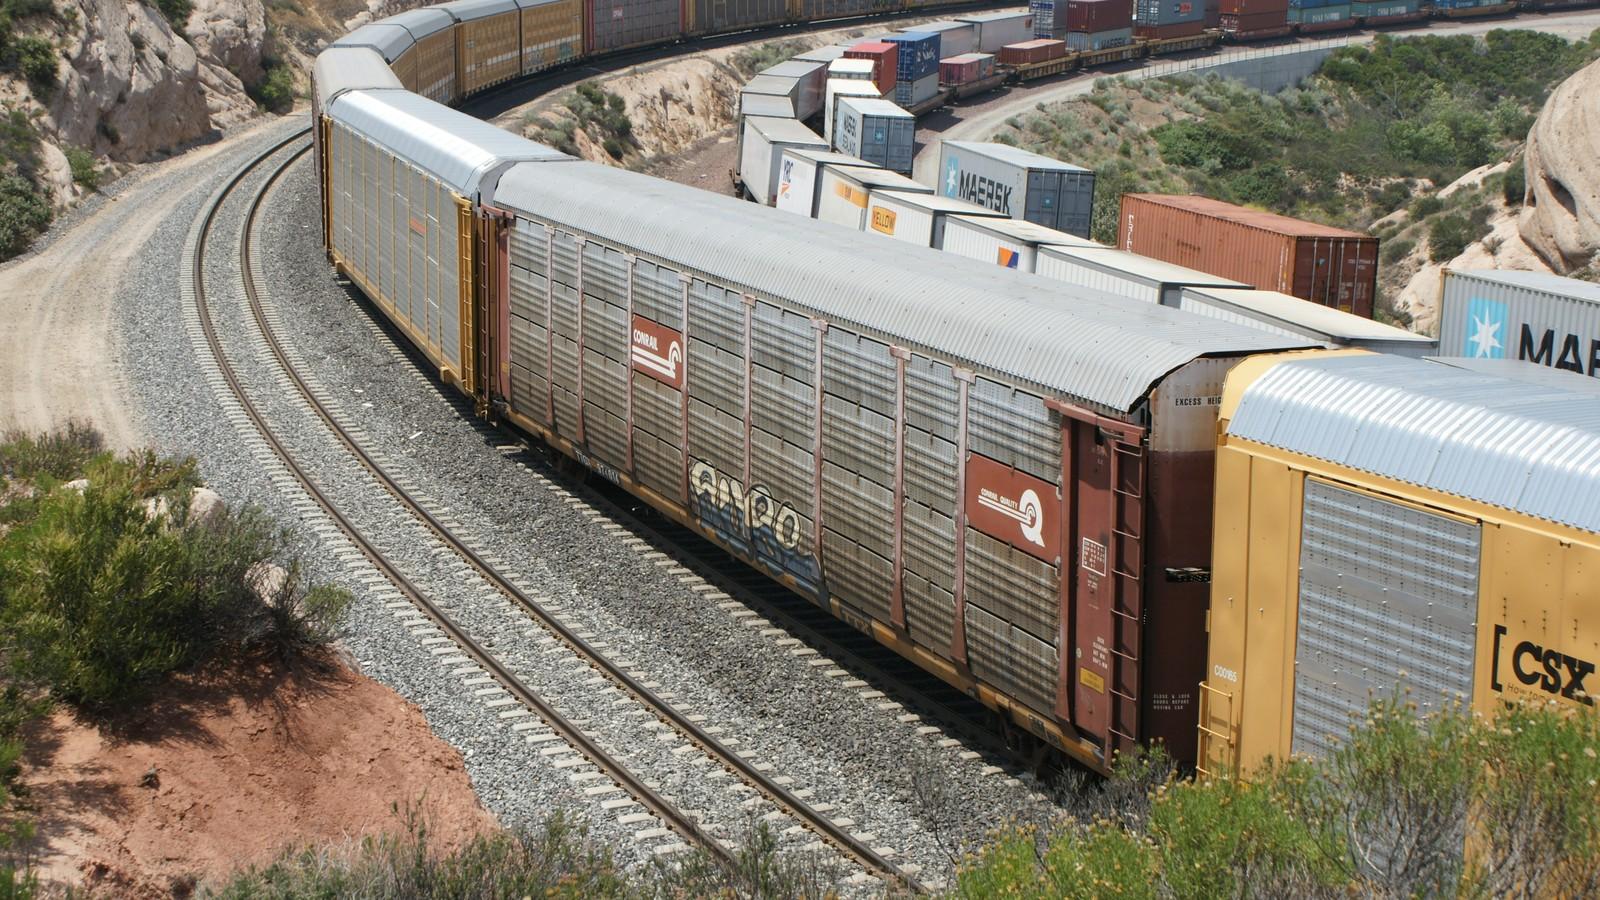 Model Train Railroad Cars At Lionel Trains